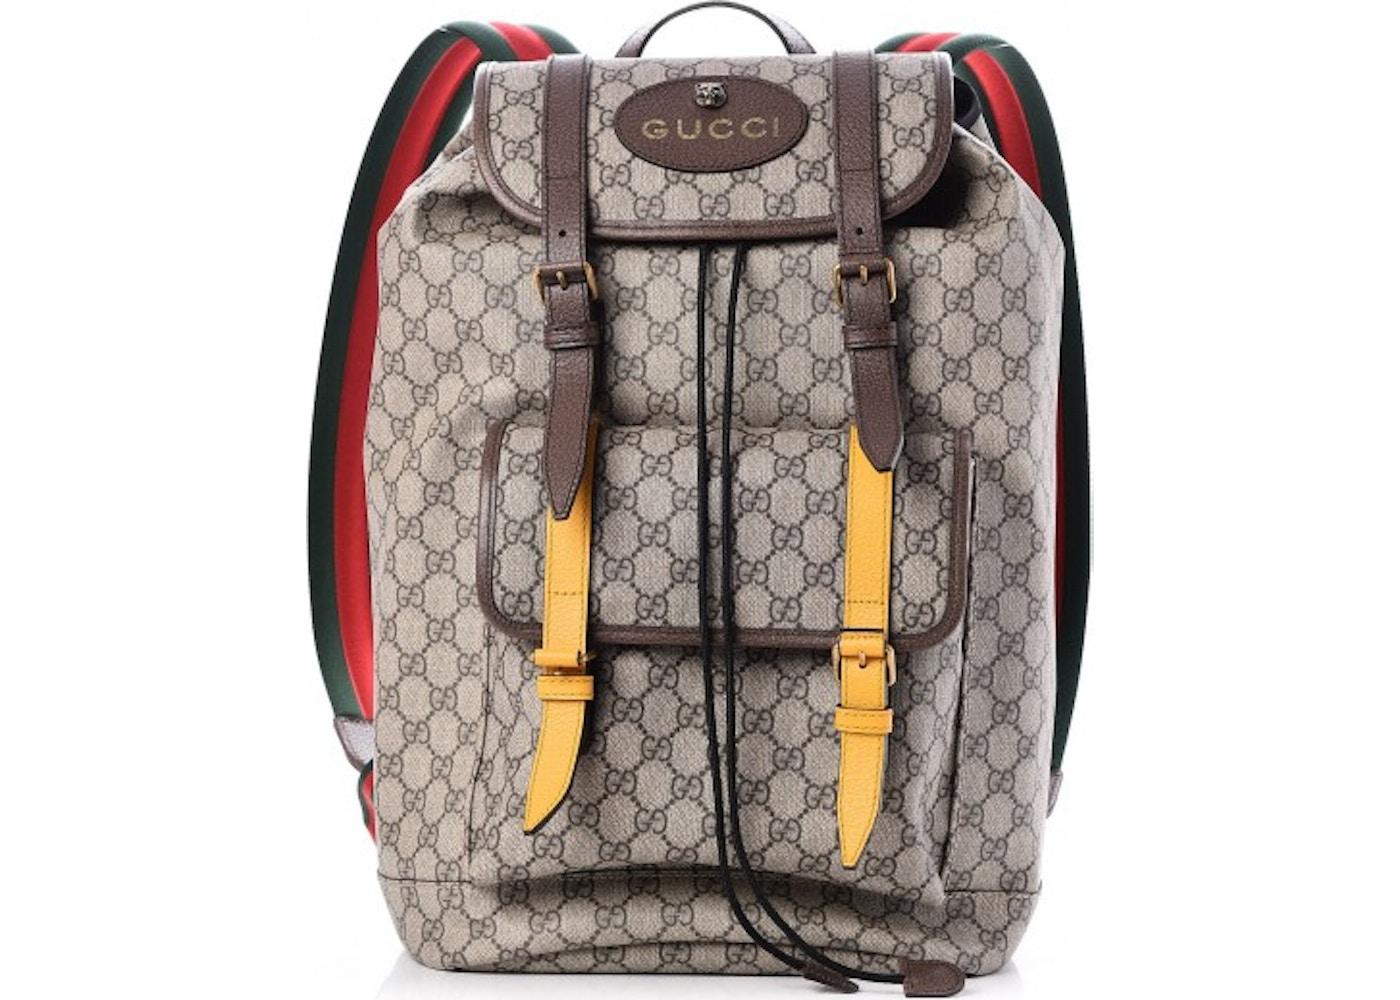 79b120def Gucci Soft Backpack GG Supreme Web Straps Brown Yellow. GG Supreme Web  Straps Brown Yellow